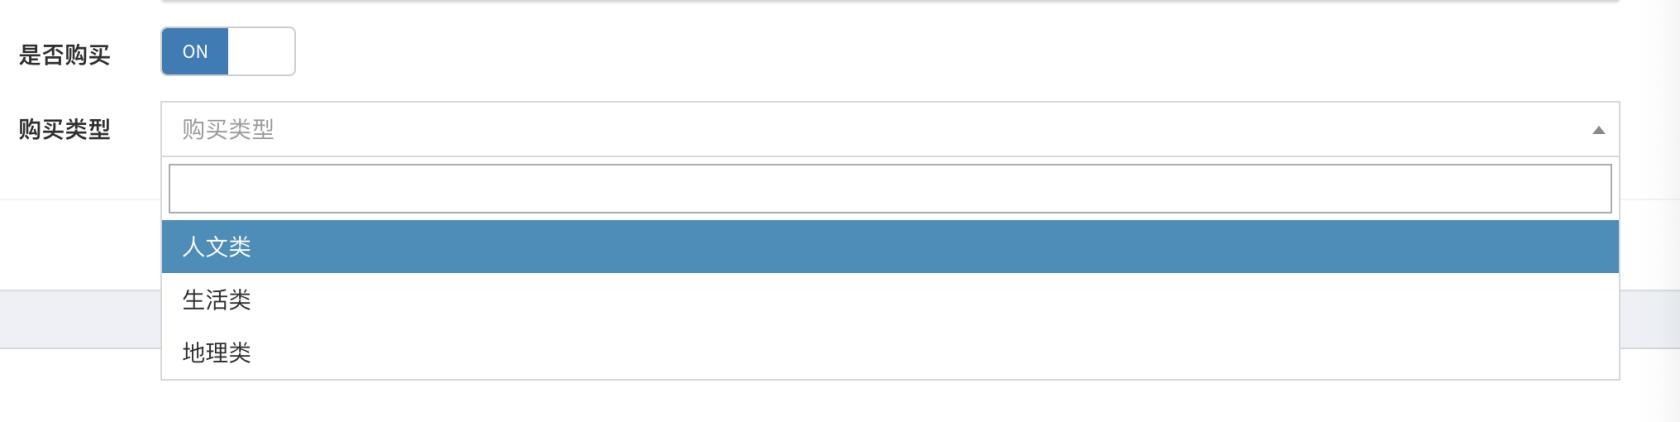 Laravel-admin框架中form表单如何根据select下拉选中事件来动态修改switch的disable状态